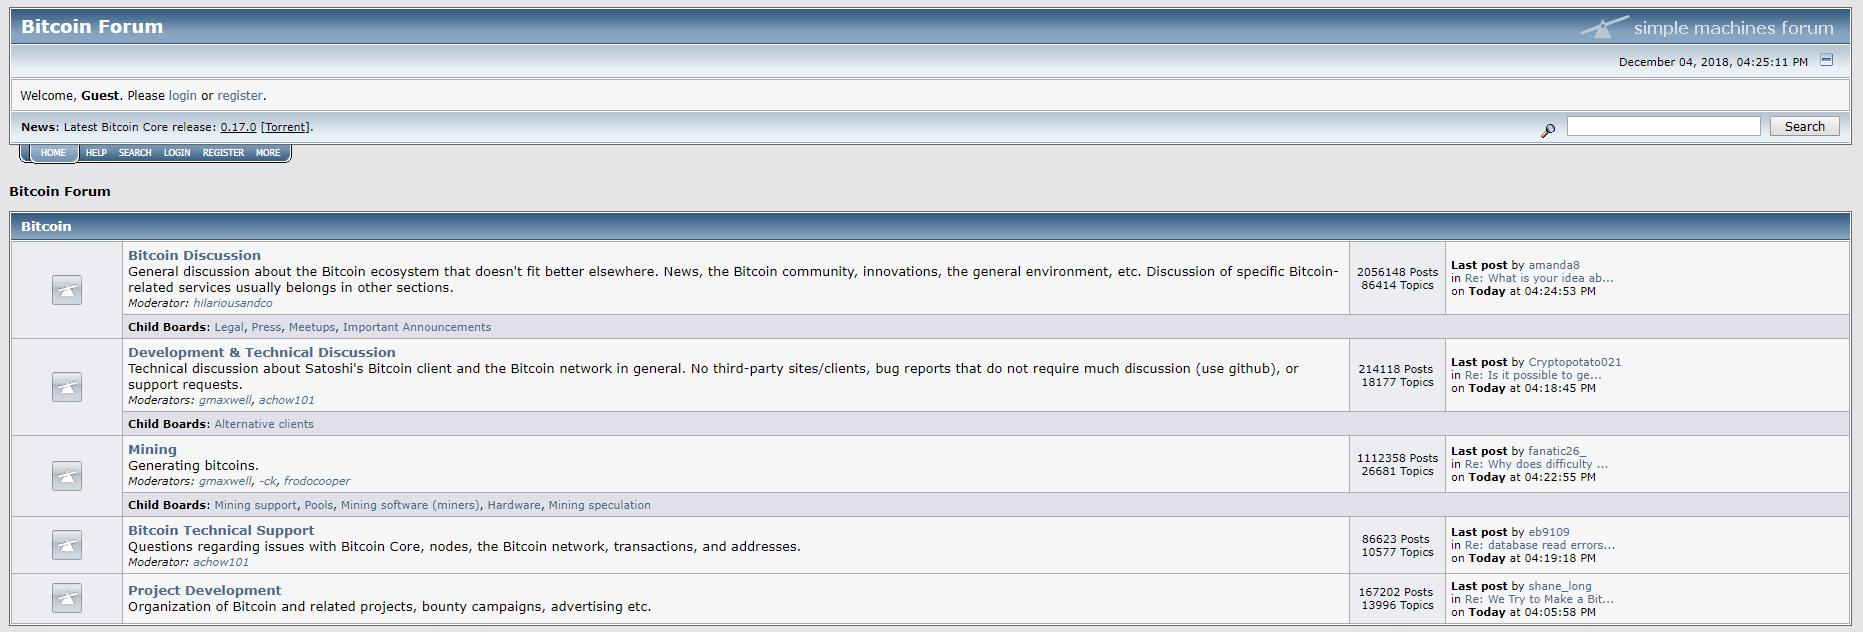 BitcoinTalk Bitcoin Forum